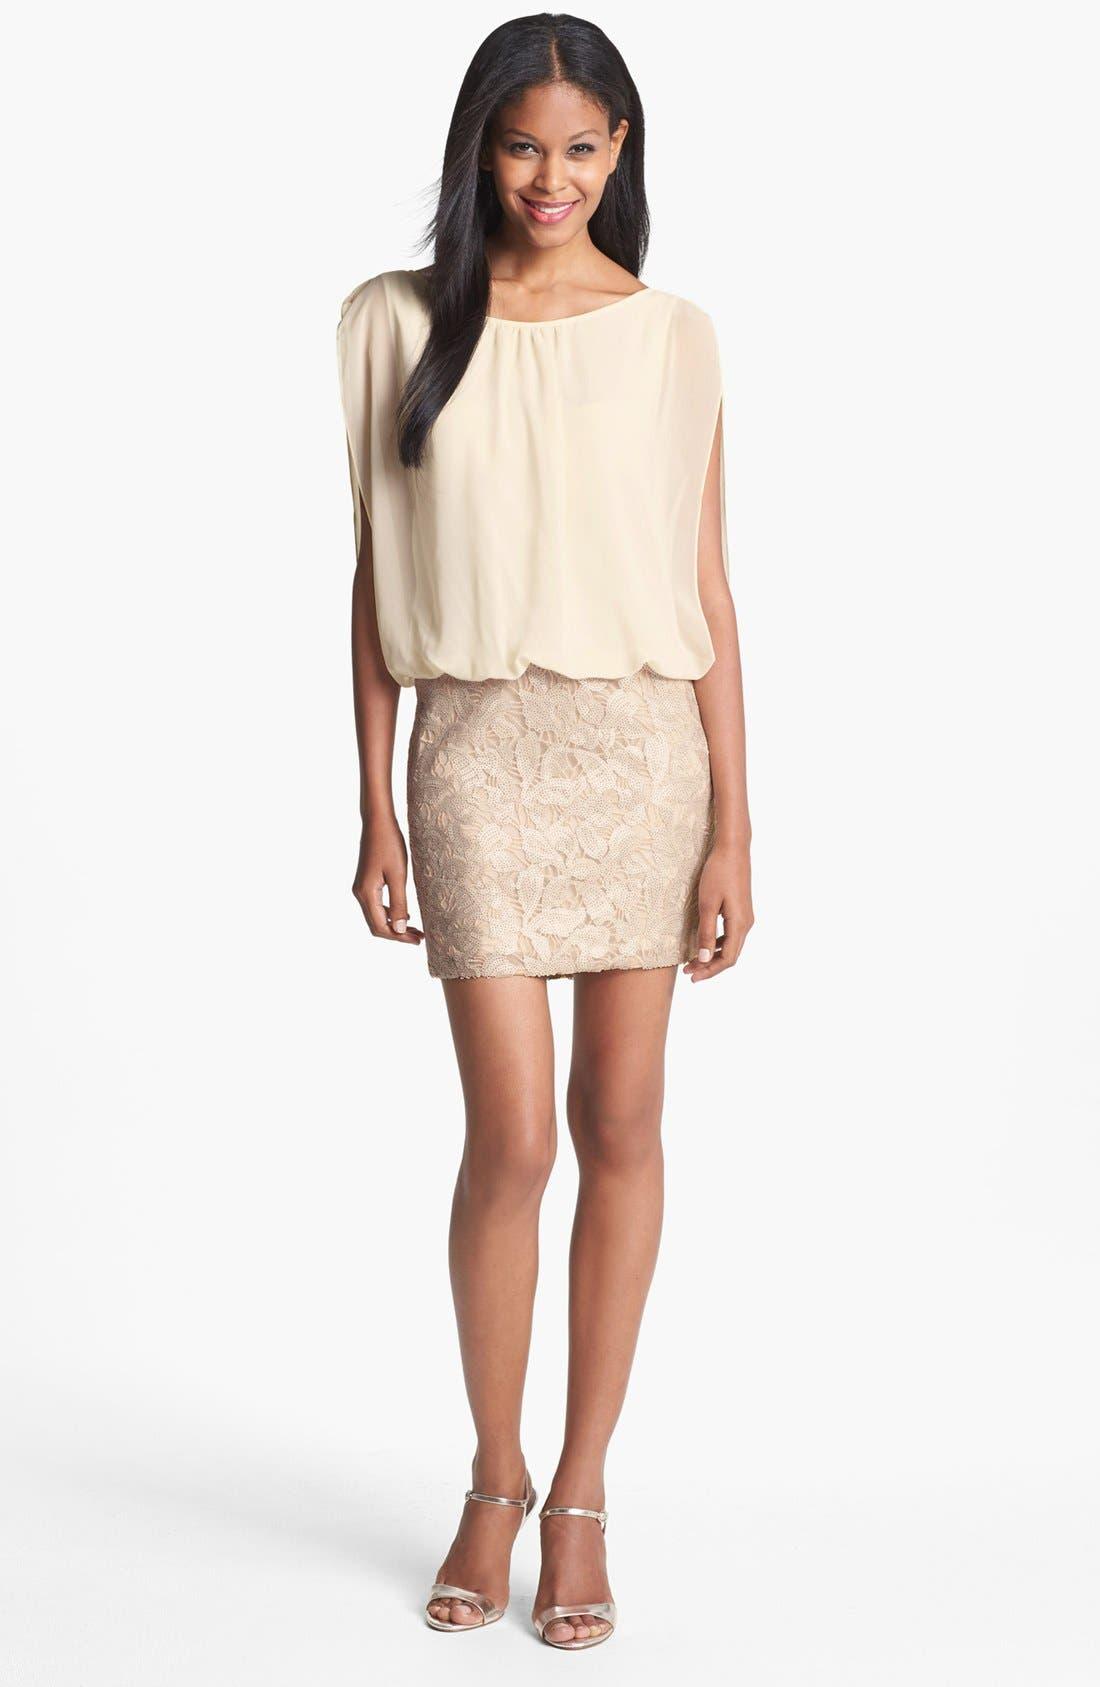 Alternate Image 1 Selected - Aidan Mattox Embellished Blouson Dress (Online Only)